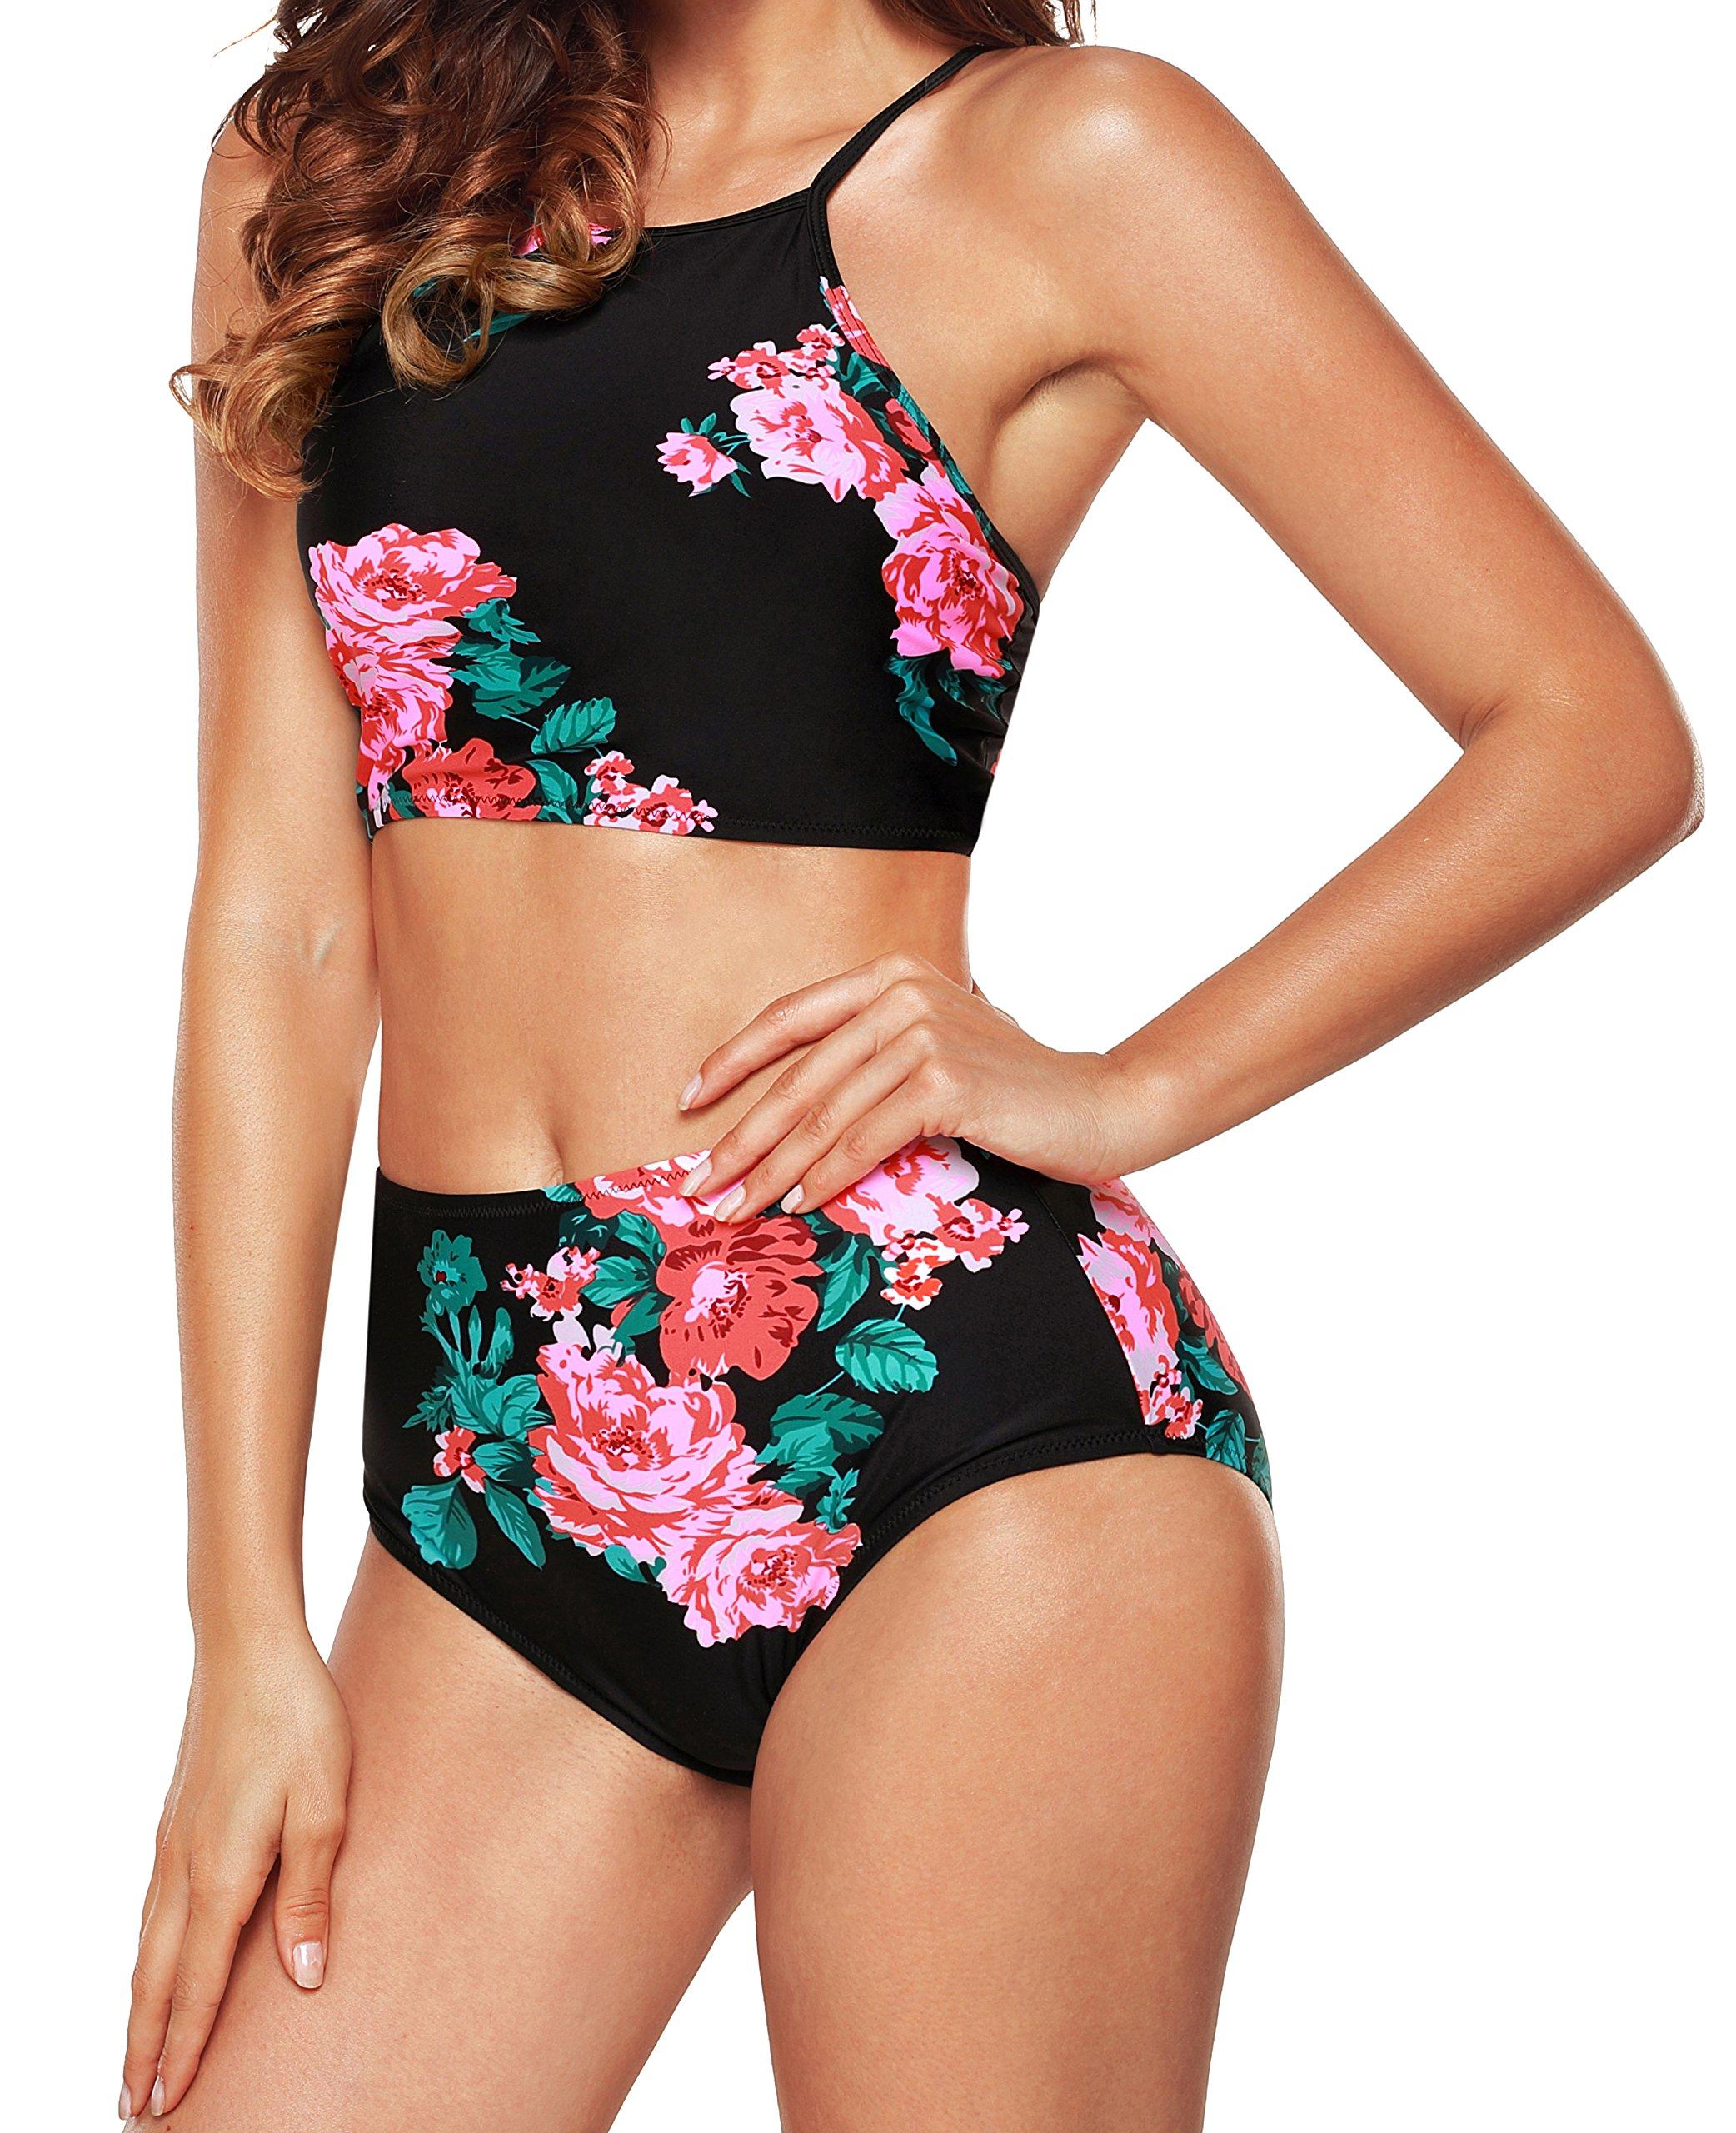 a4707a6a50 Galleon - Angerella Bandeau Bikini Top High Neck Swimsuits For Women  Bathing Suits Swimwear(Green